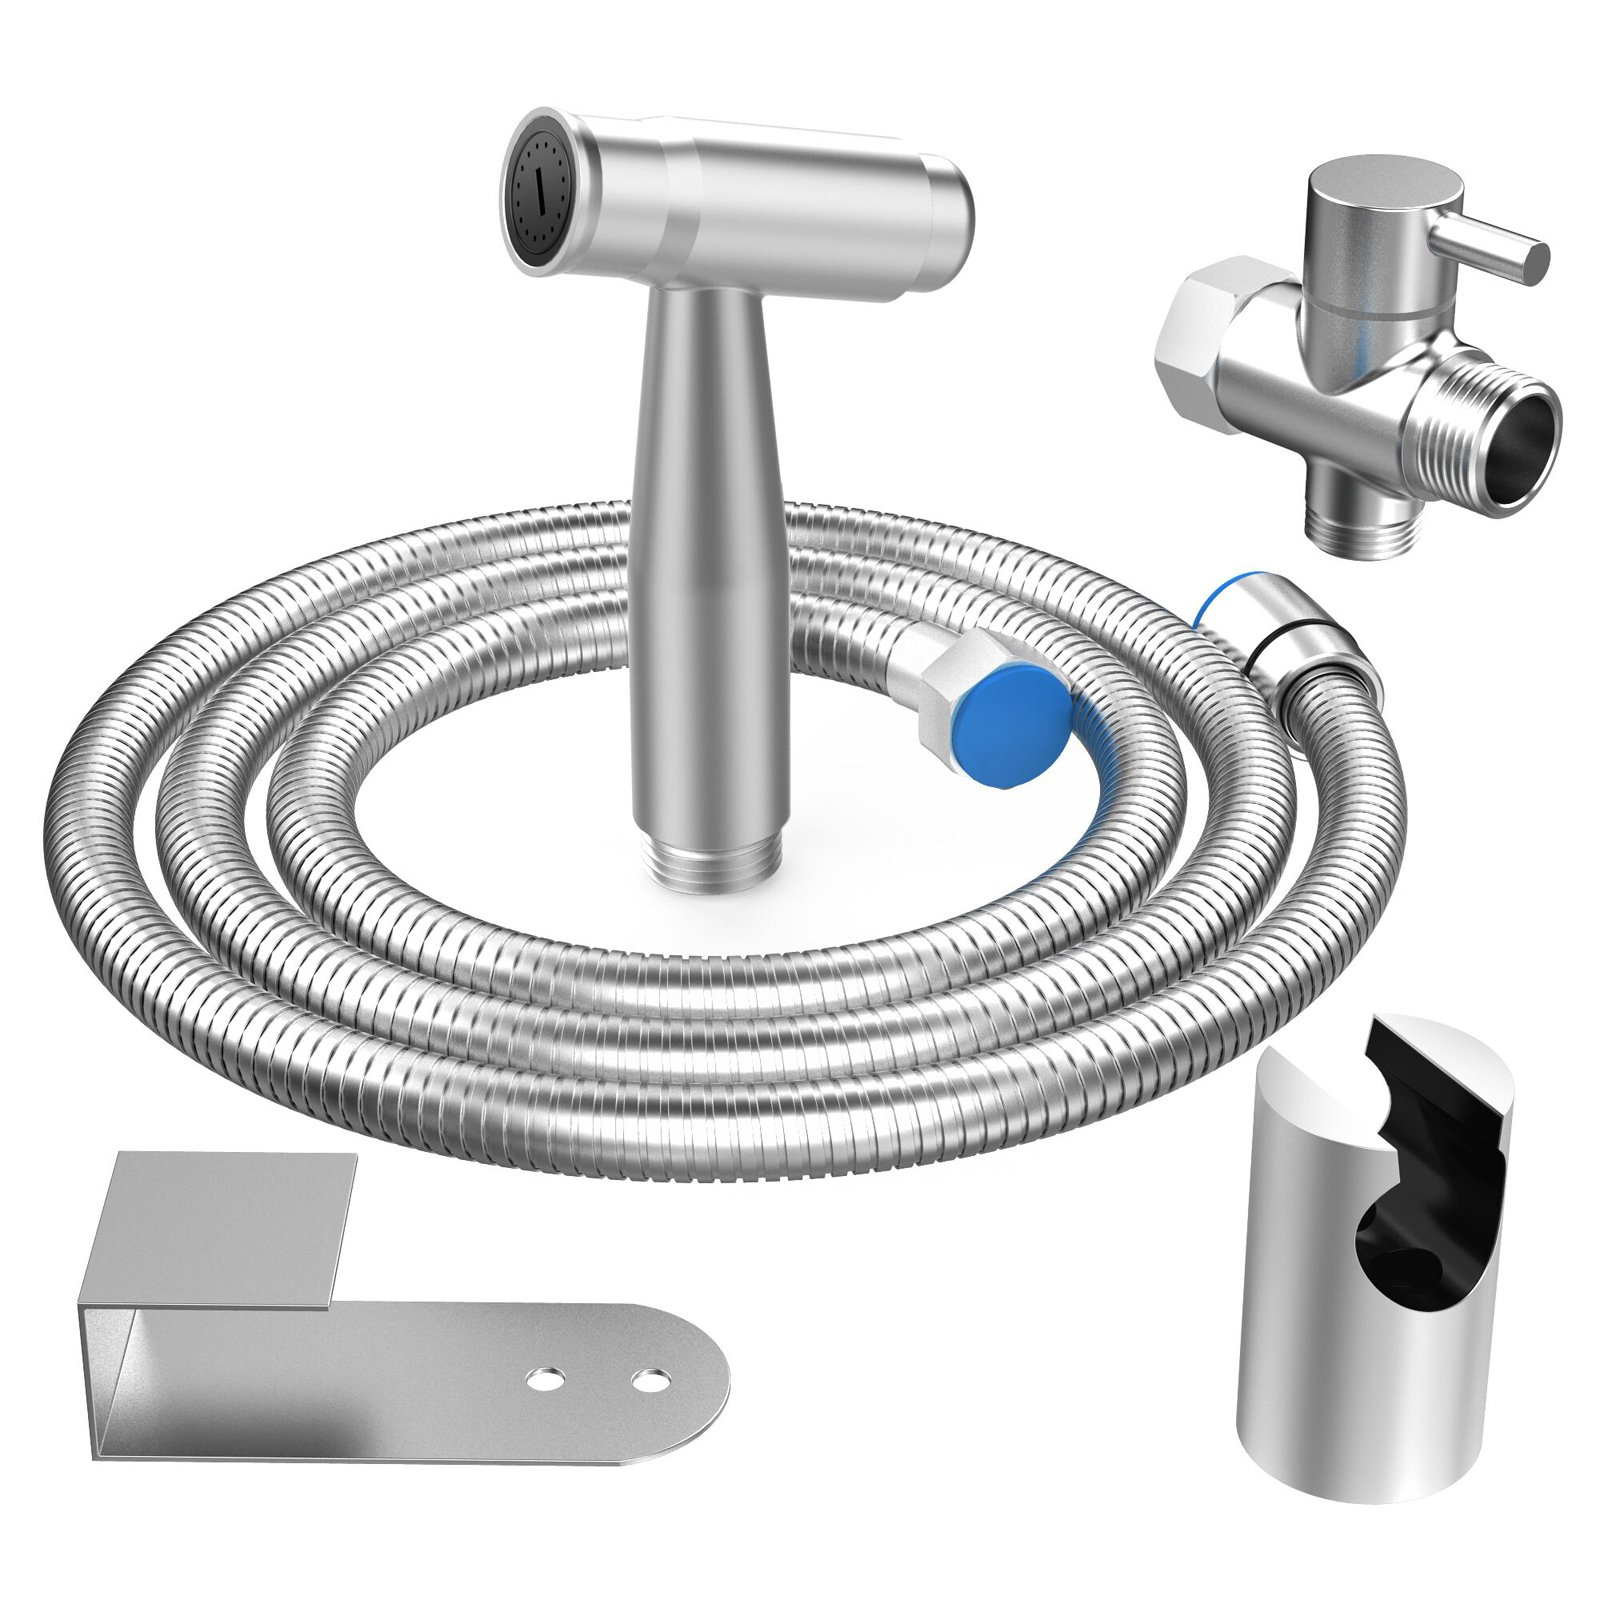 EIGSO Free press handheld bidet sprayer for toilet,Complete Premium Stainless Steel Bathroom Shattaf Sprayer Best Used for Personal Hygiene and Potty Toilet Spray